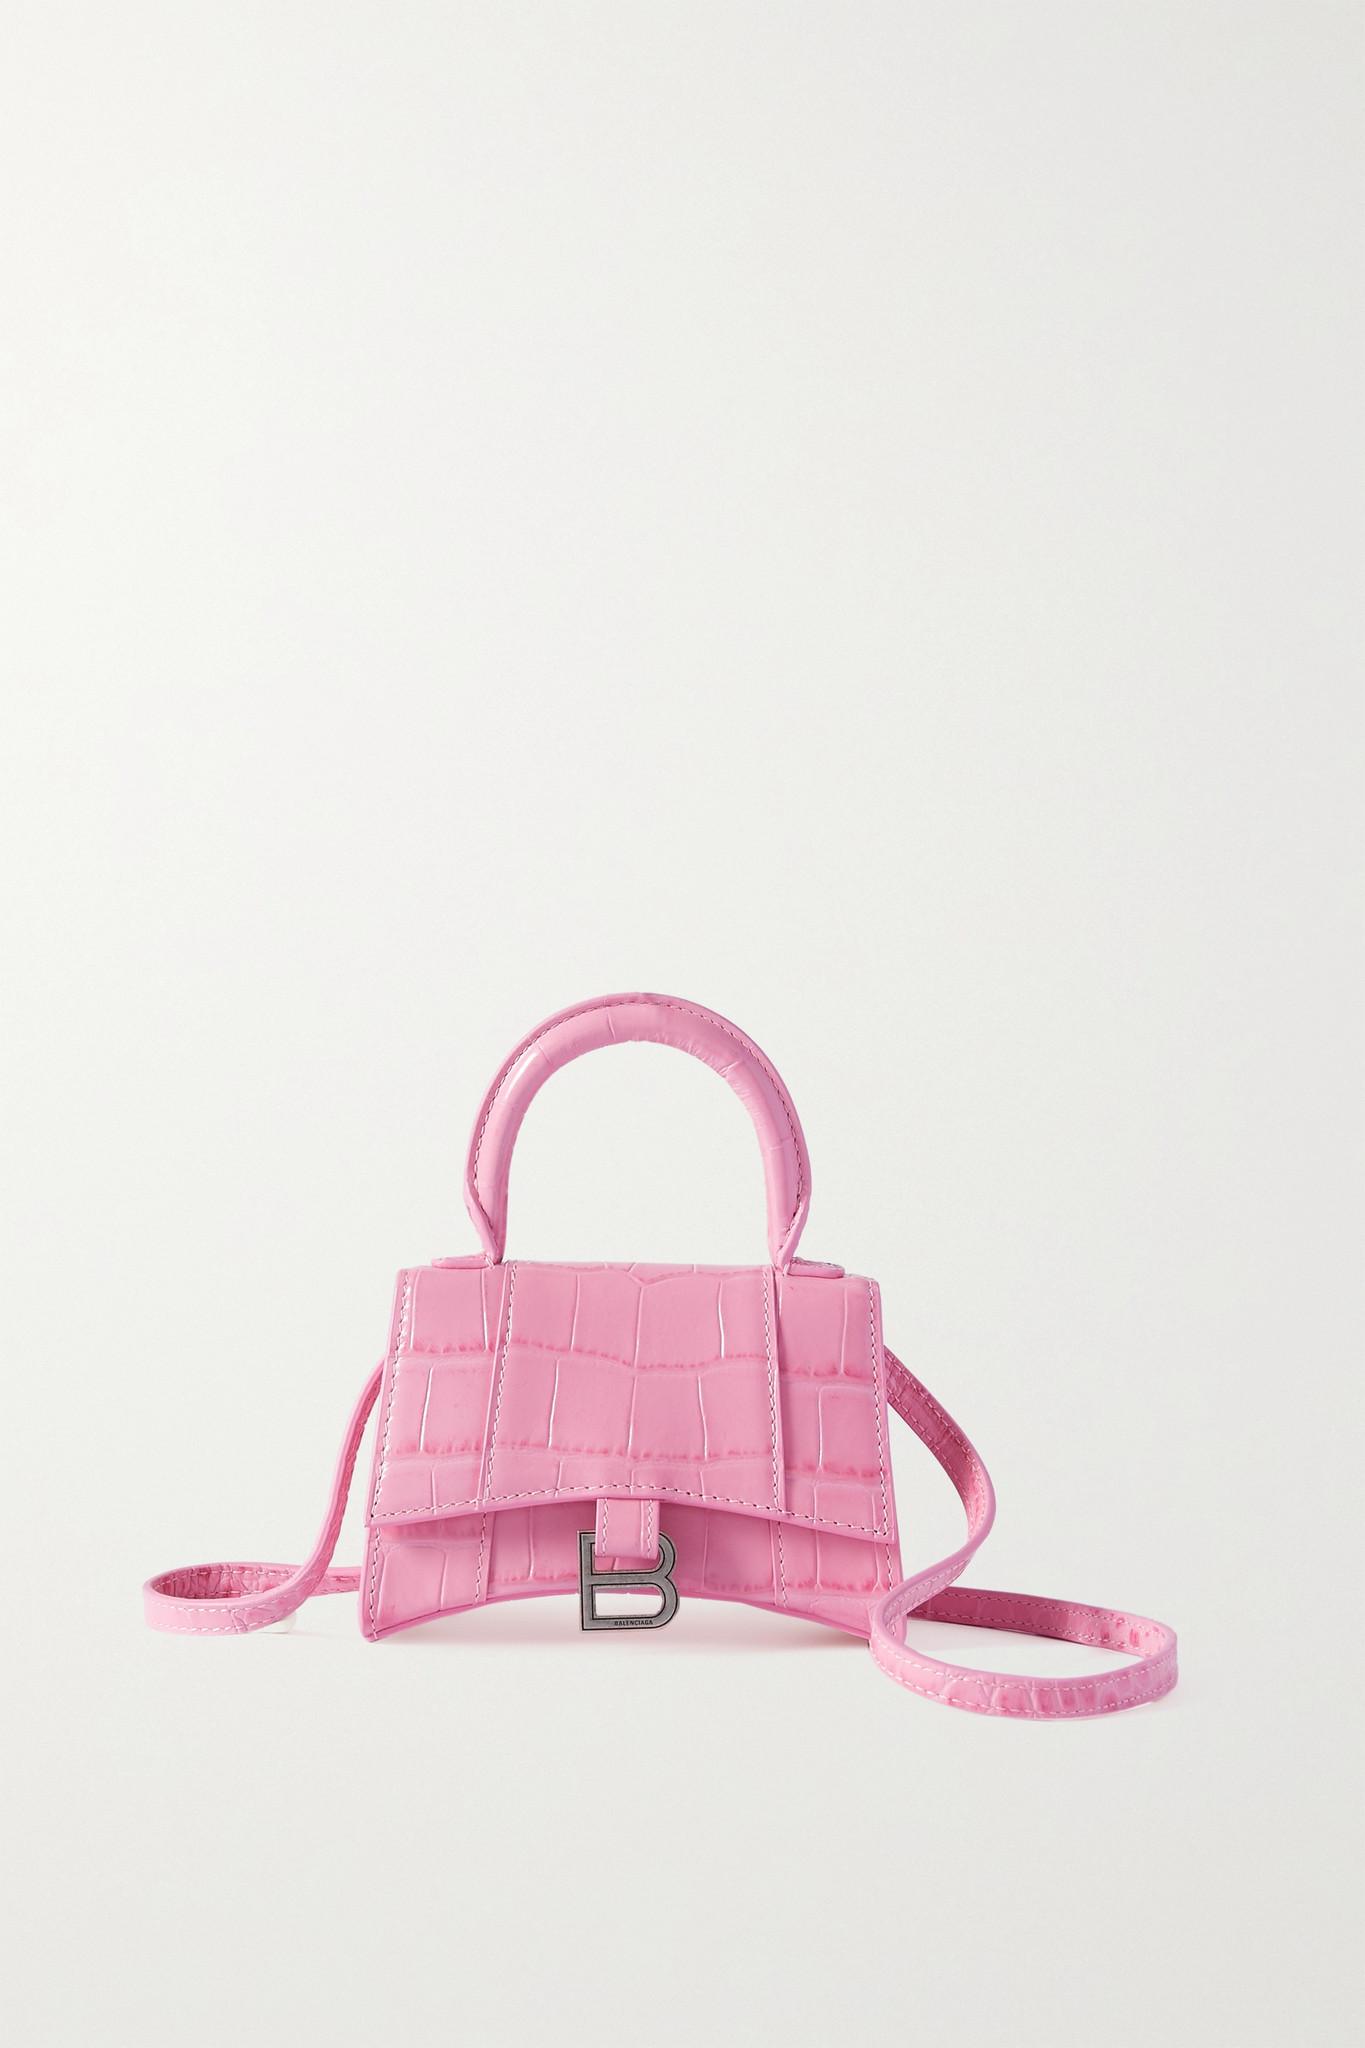 BALENCIAGA - Hourglass 仿鳄鱼纹皮革超迷你手提包 - 粉红色 - one size